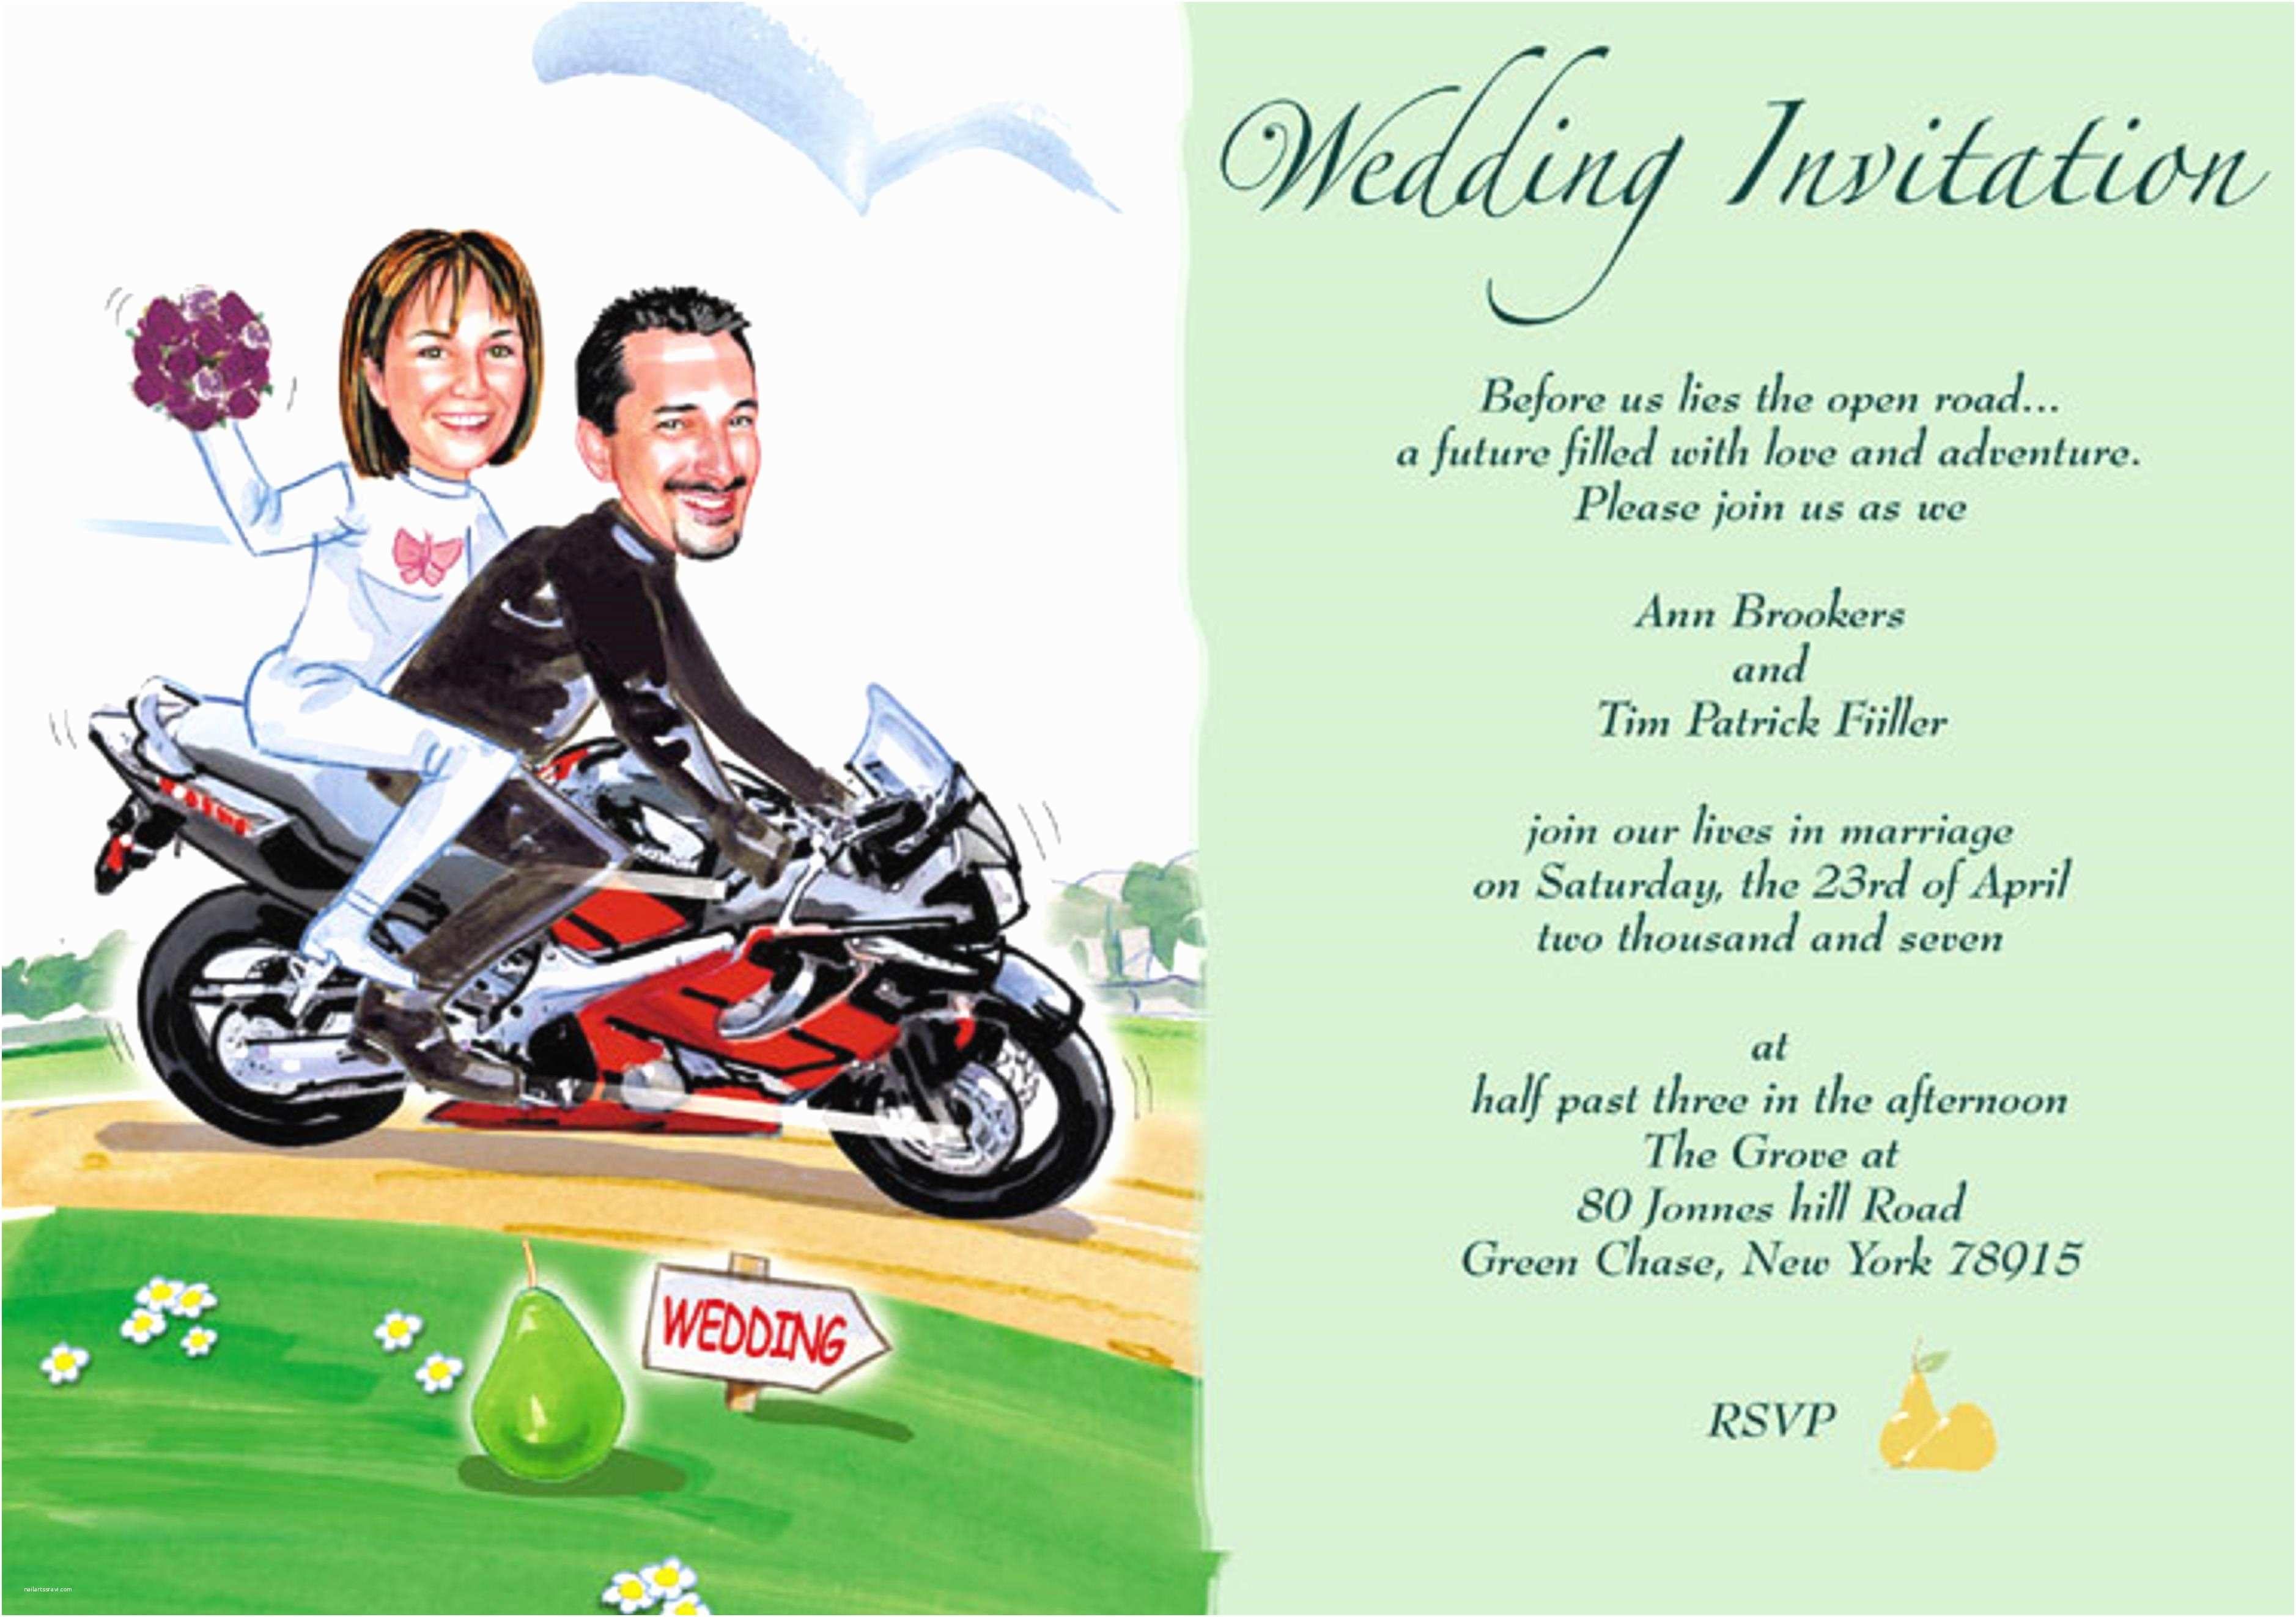 Funny Wedding Invitations Funny Wedding Invitations Planner Wedding Get More